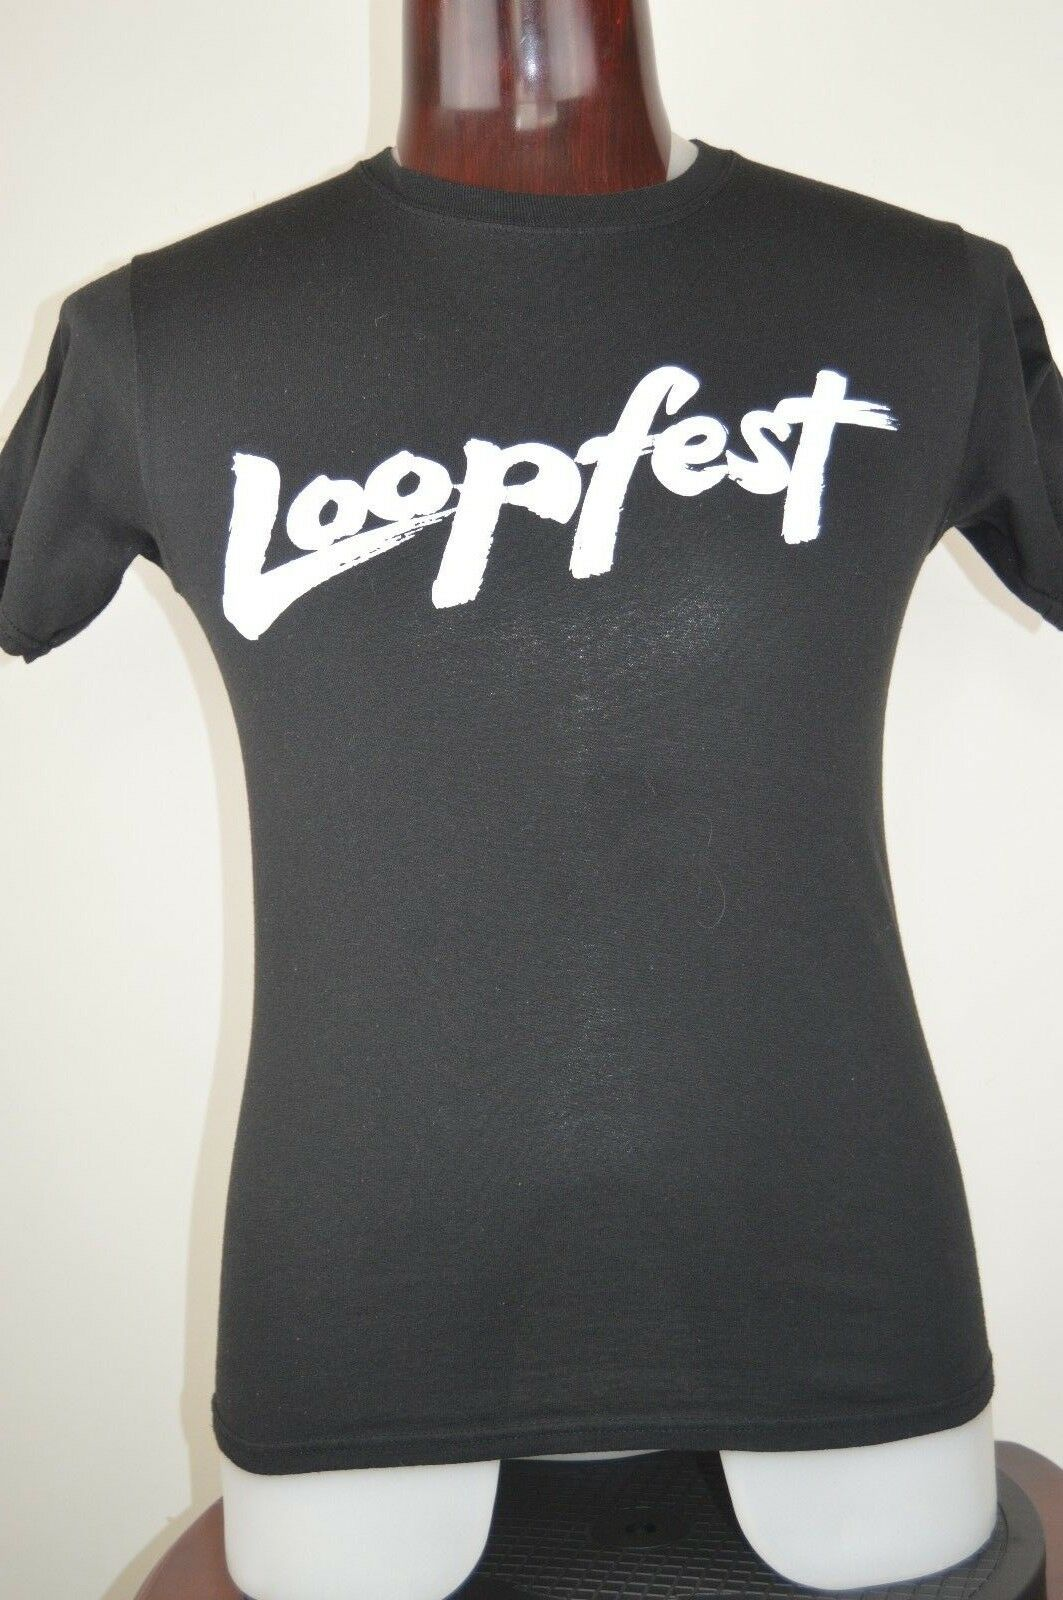 Loopfest Chicago Radio Rock WLUP The Loop 97.9 S Mens T